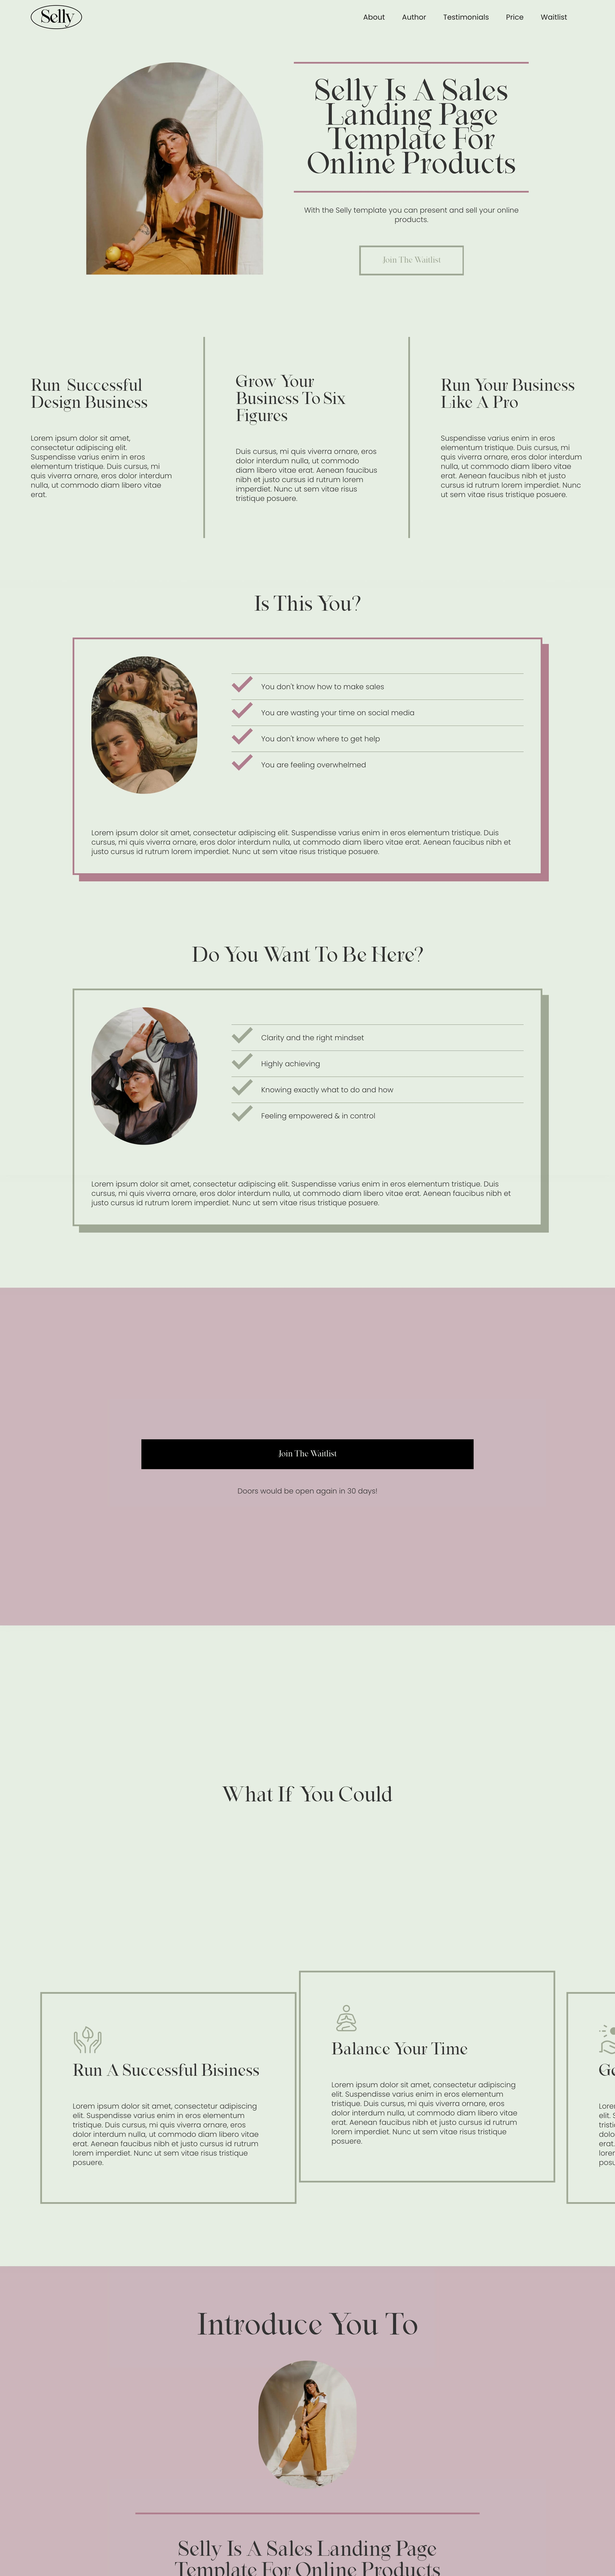 Selly Website Screenshot